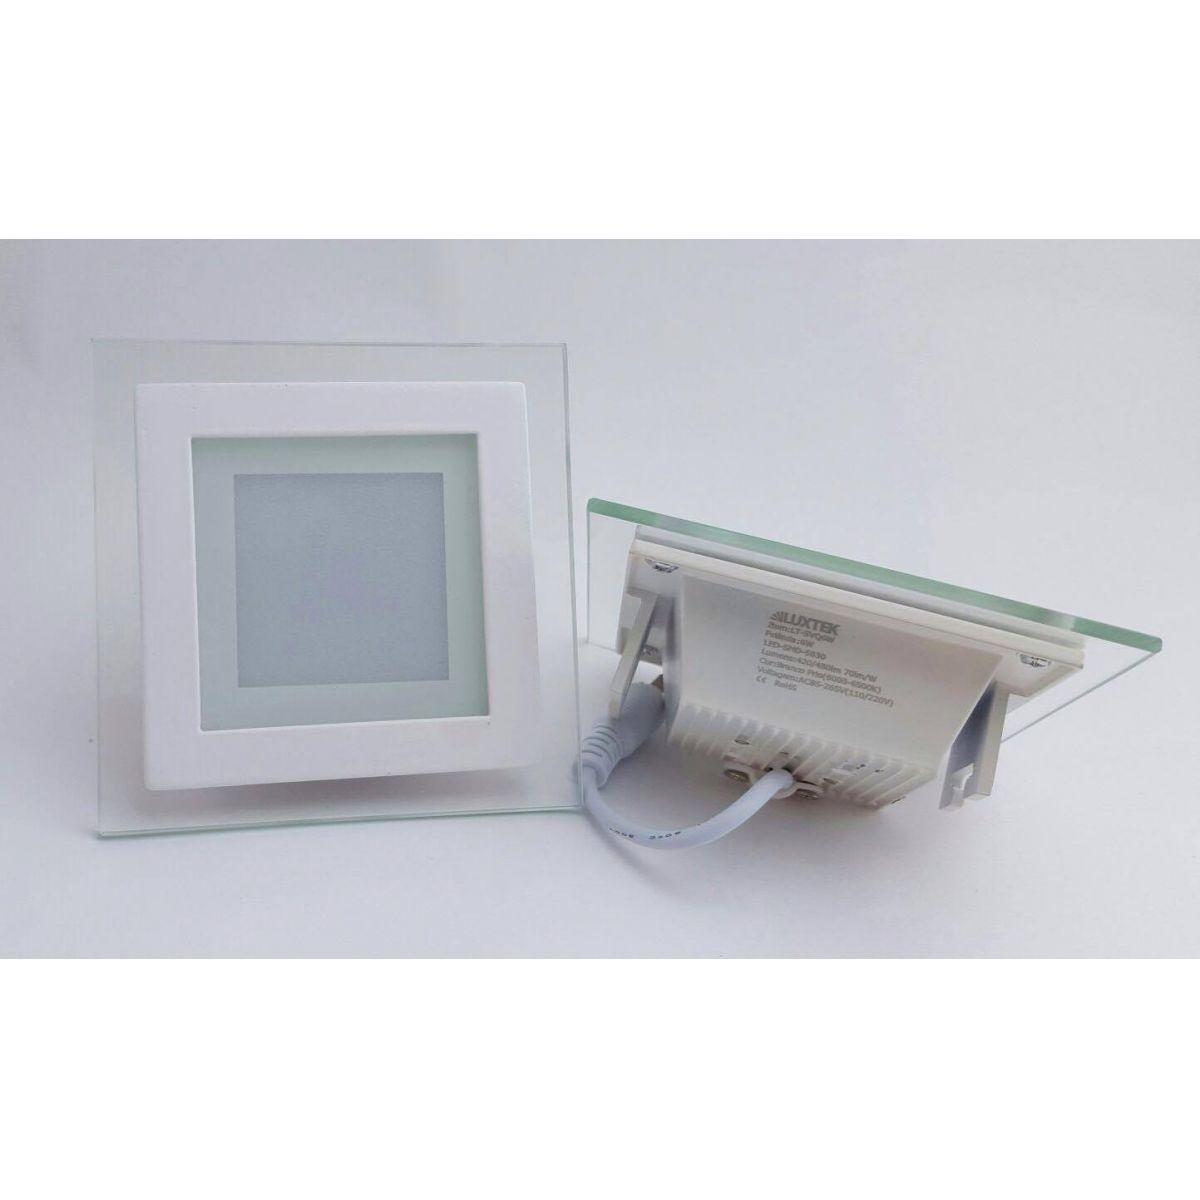 Luminária Plafon LED 16w de Vidro Embutir Branco Frio Redonda / Quadrada - LUXTEK